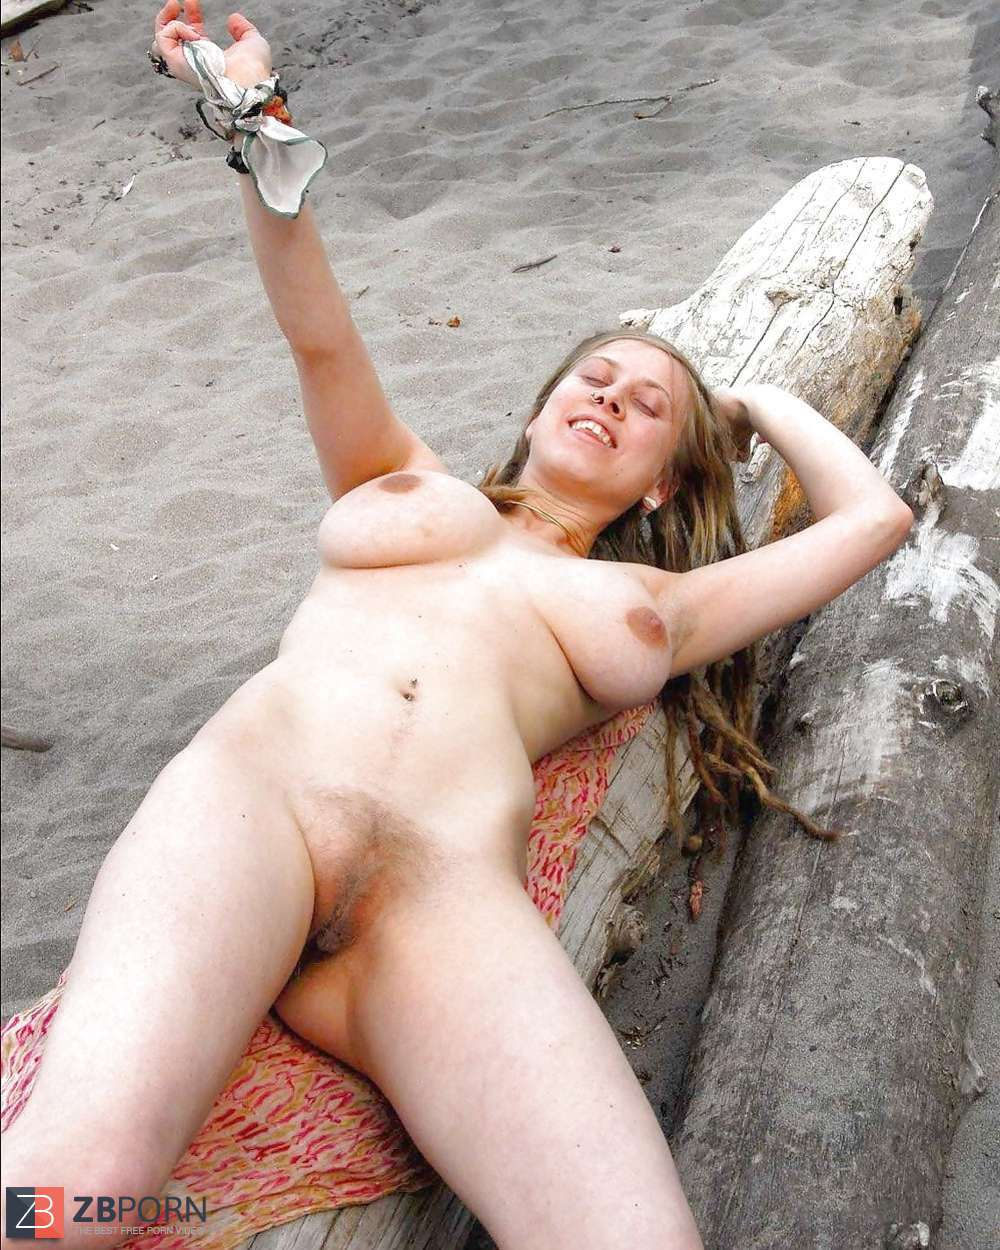 Sex On Nude Beach Pics